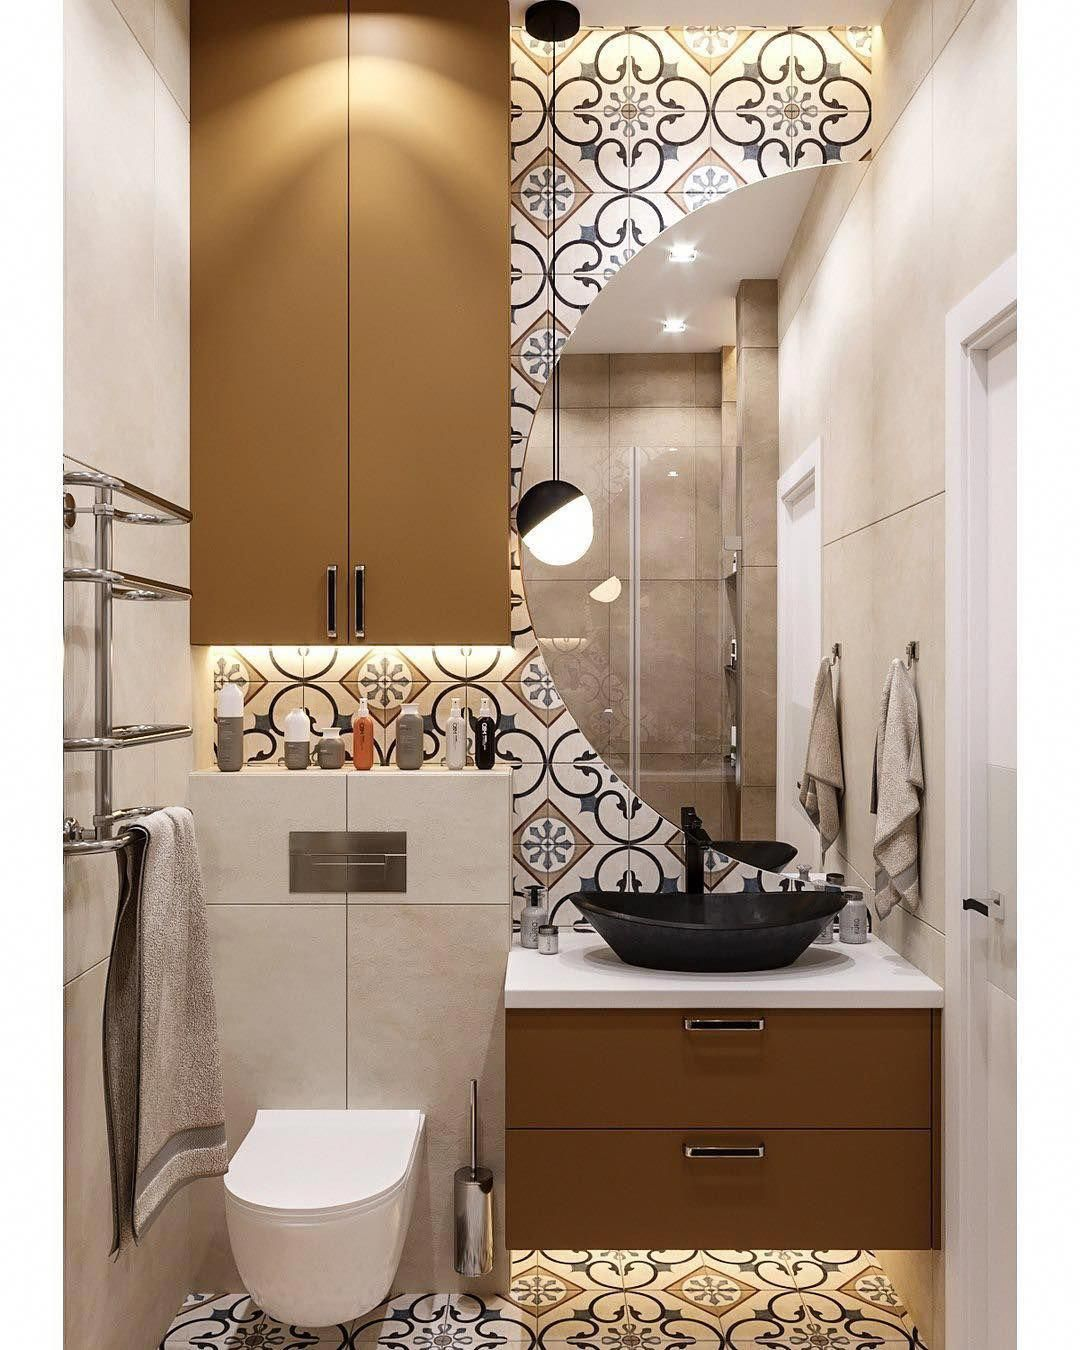 Small Comfort Room Tiles Design: Tutorial: Customize Your Earphones With Wool